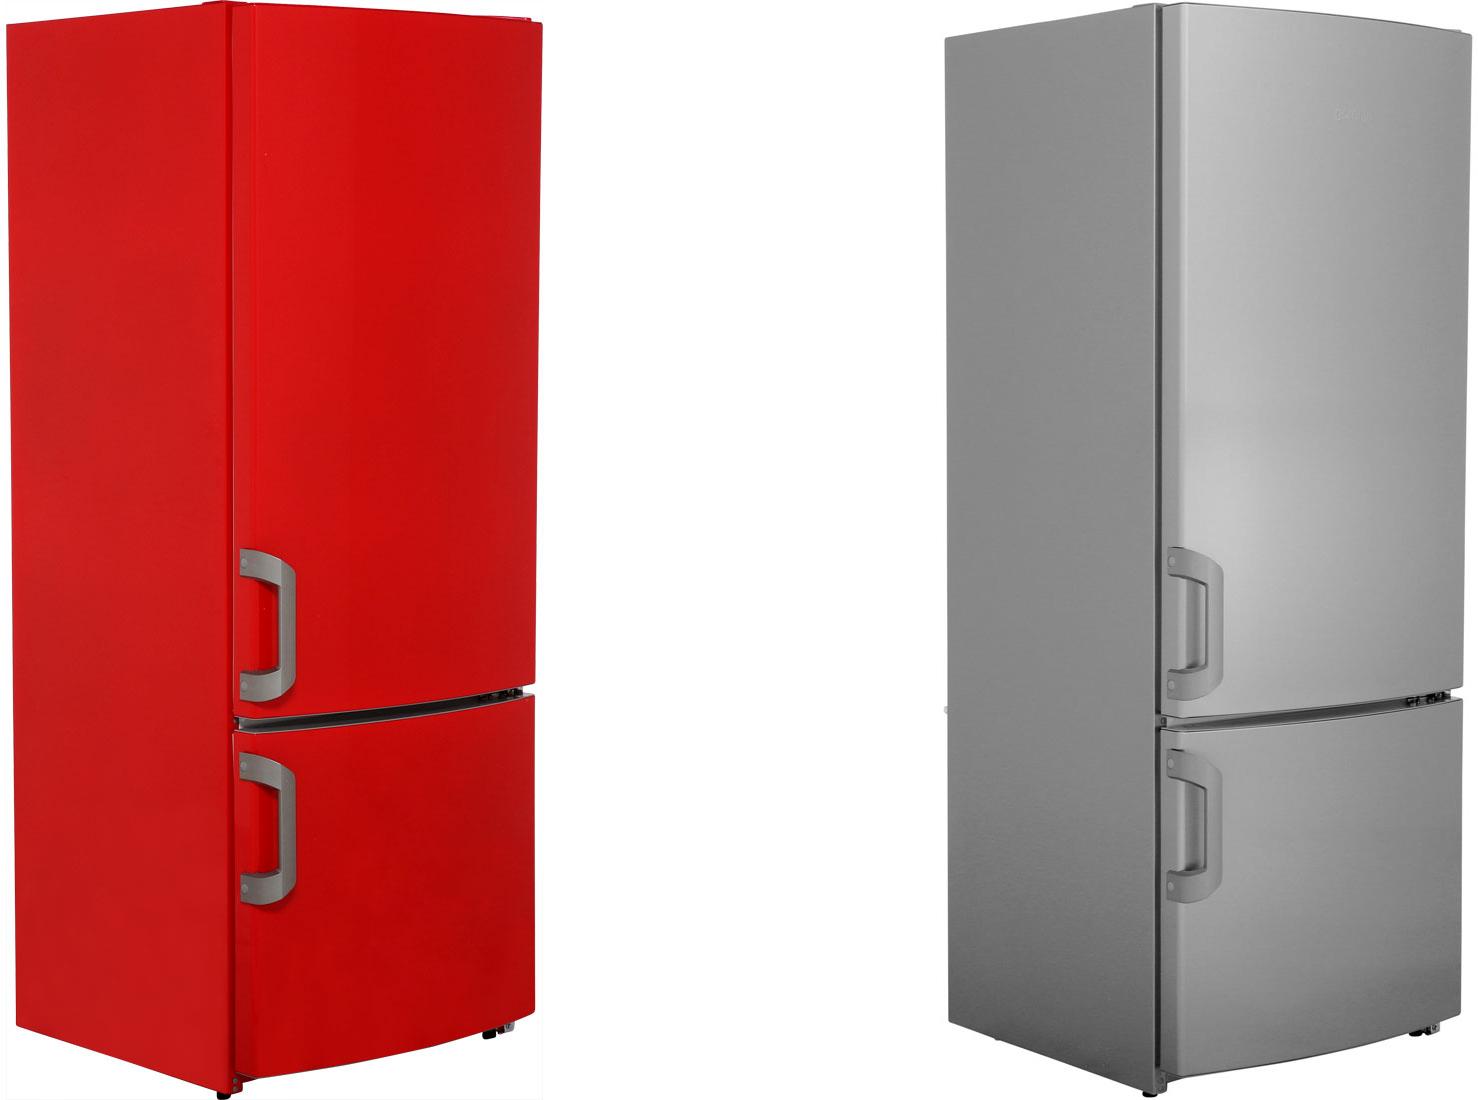 Kühlschrank Kombi Retro : Gorenje spartage bei ao z b rote retro kühlschränke ab